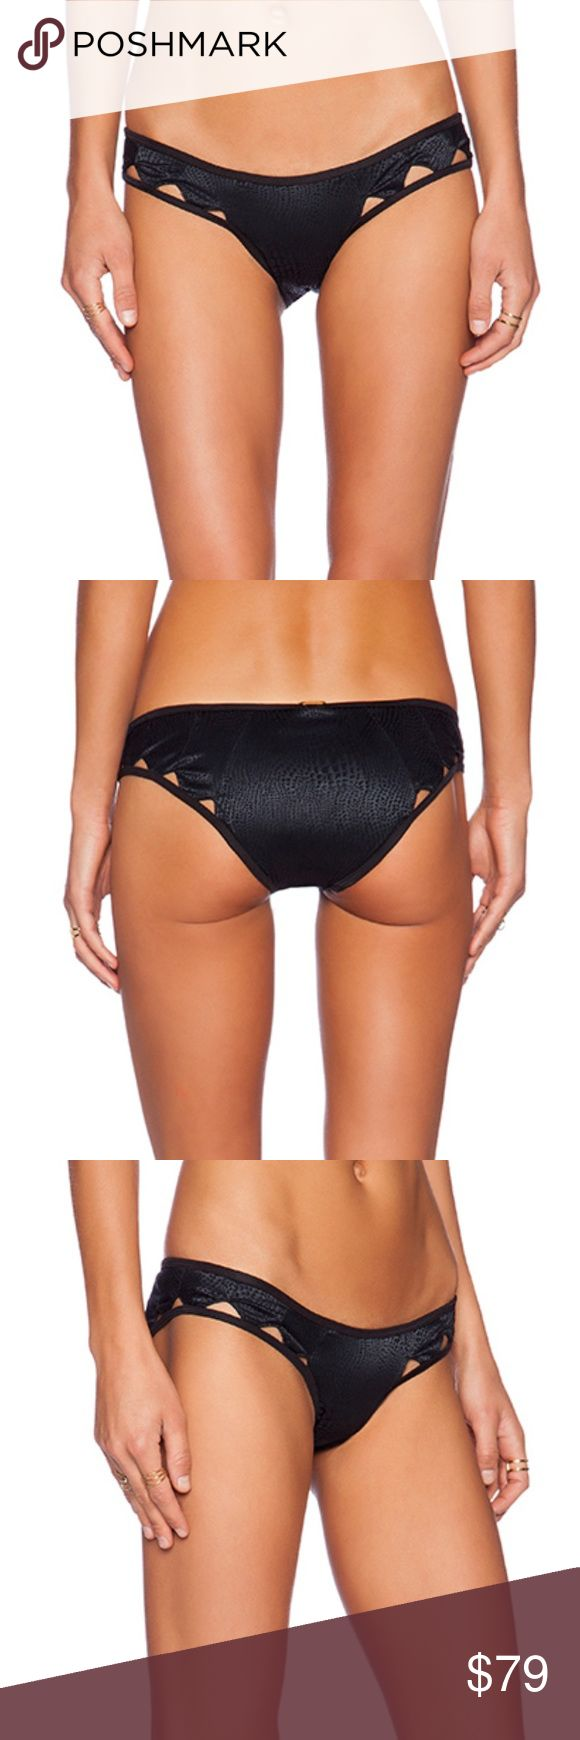 NWT Beach Bunny Jagged Edge Bikini Bottoms ABOUT THE BRAND 88% polyamide , 12% spandex Hand wash cold Monochromatic animal print Cut-out trim Beach Bunny Swim